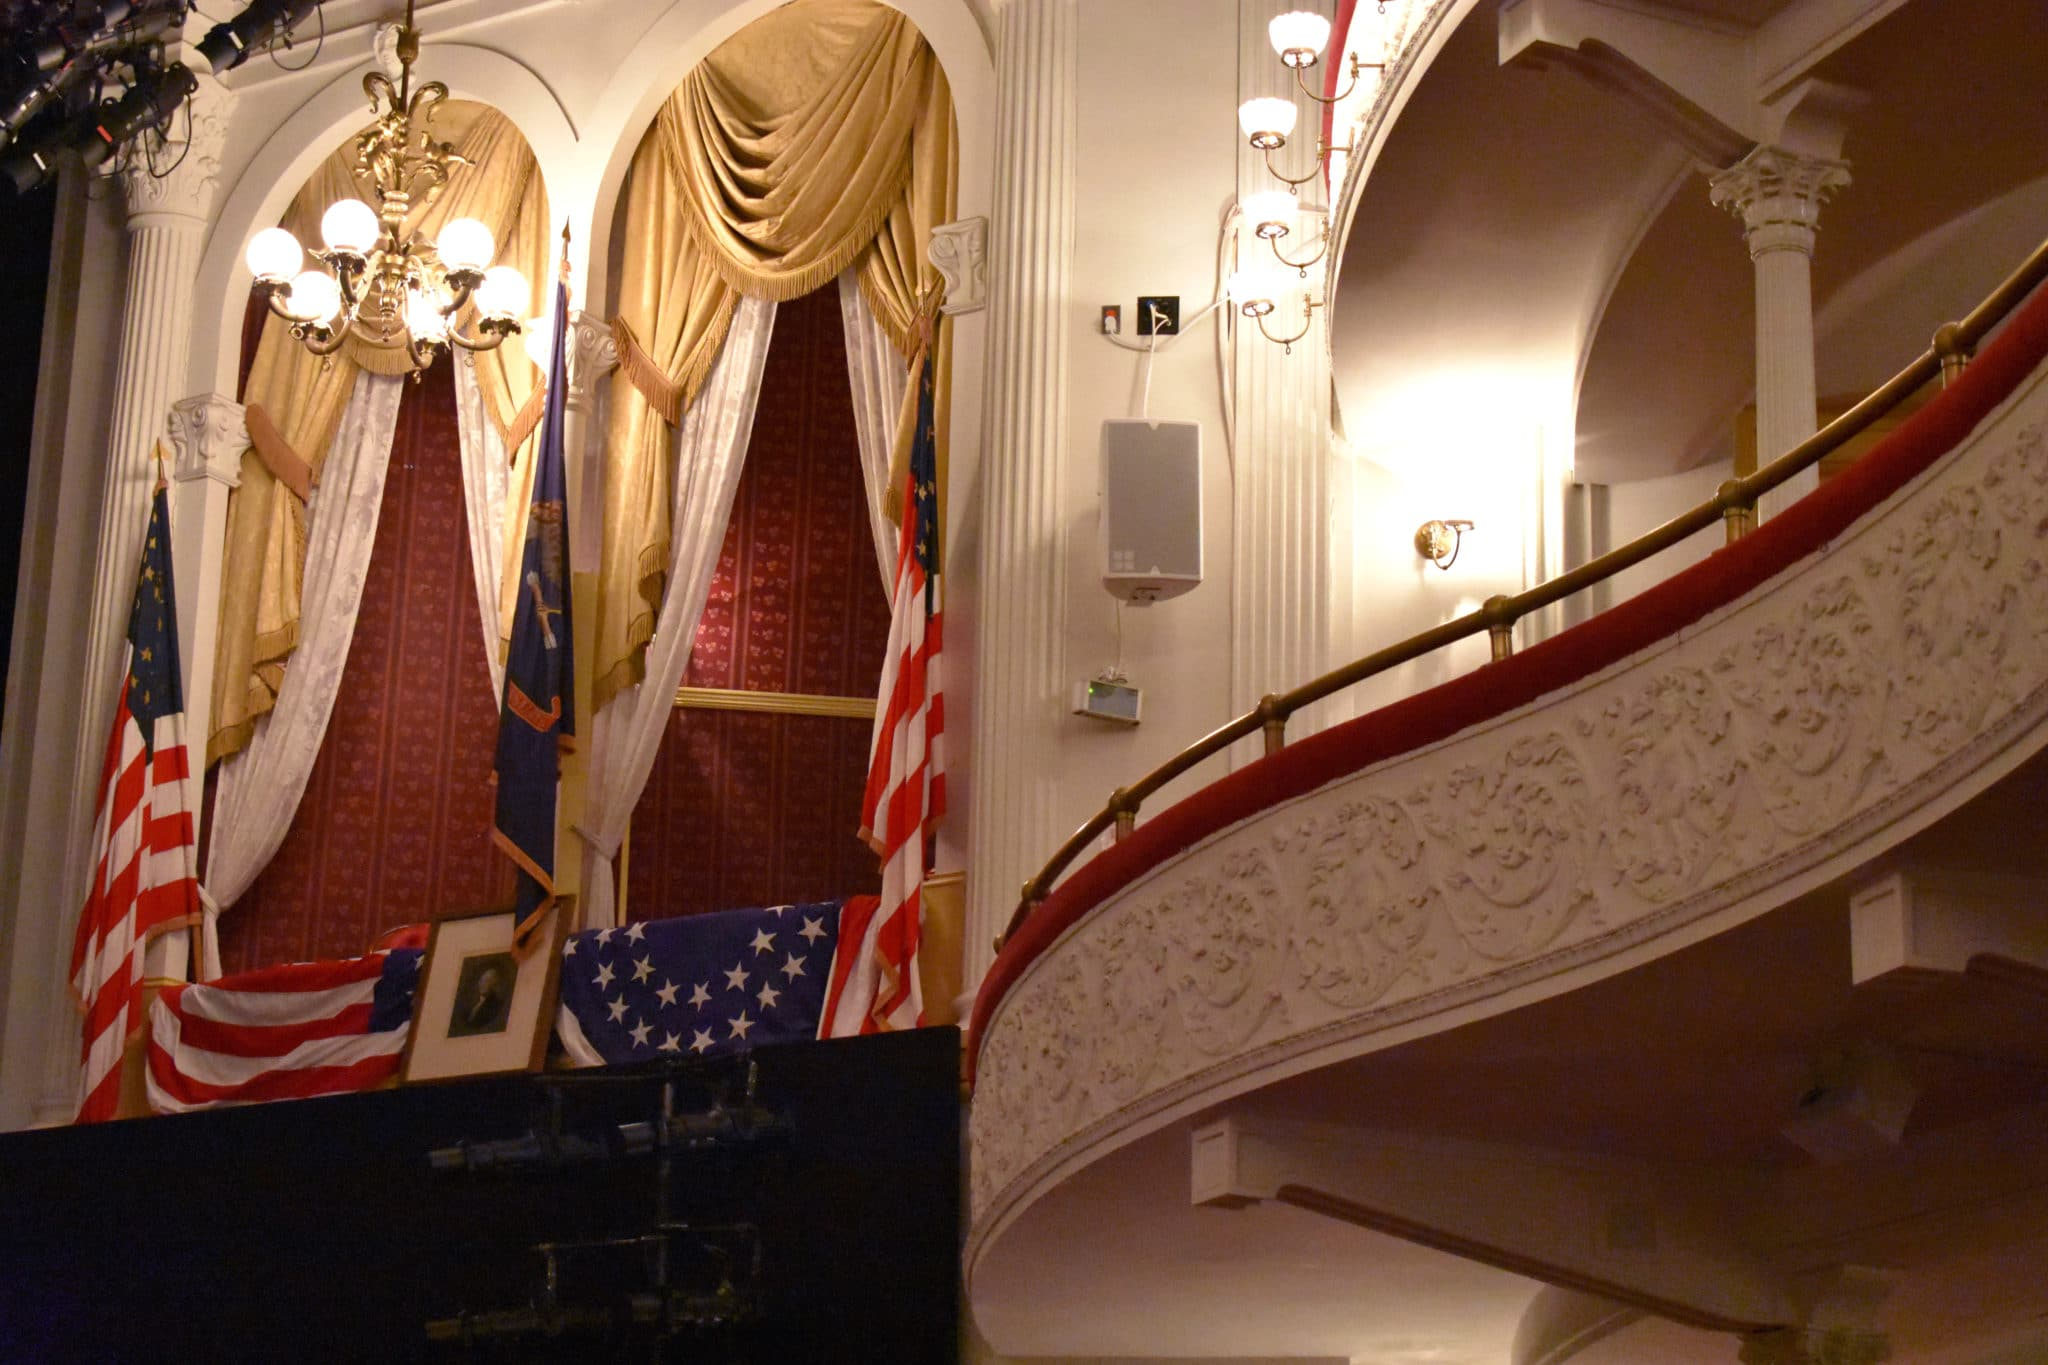 Ford's Theatre - Lincoln's Box courtesy of washington.org